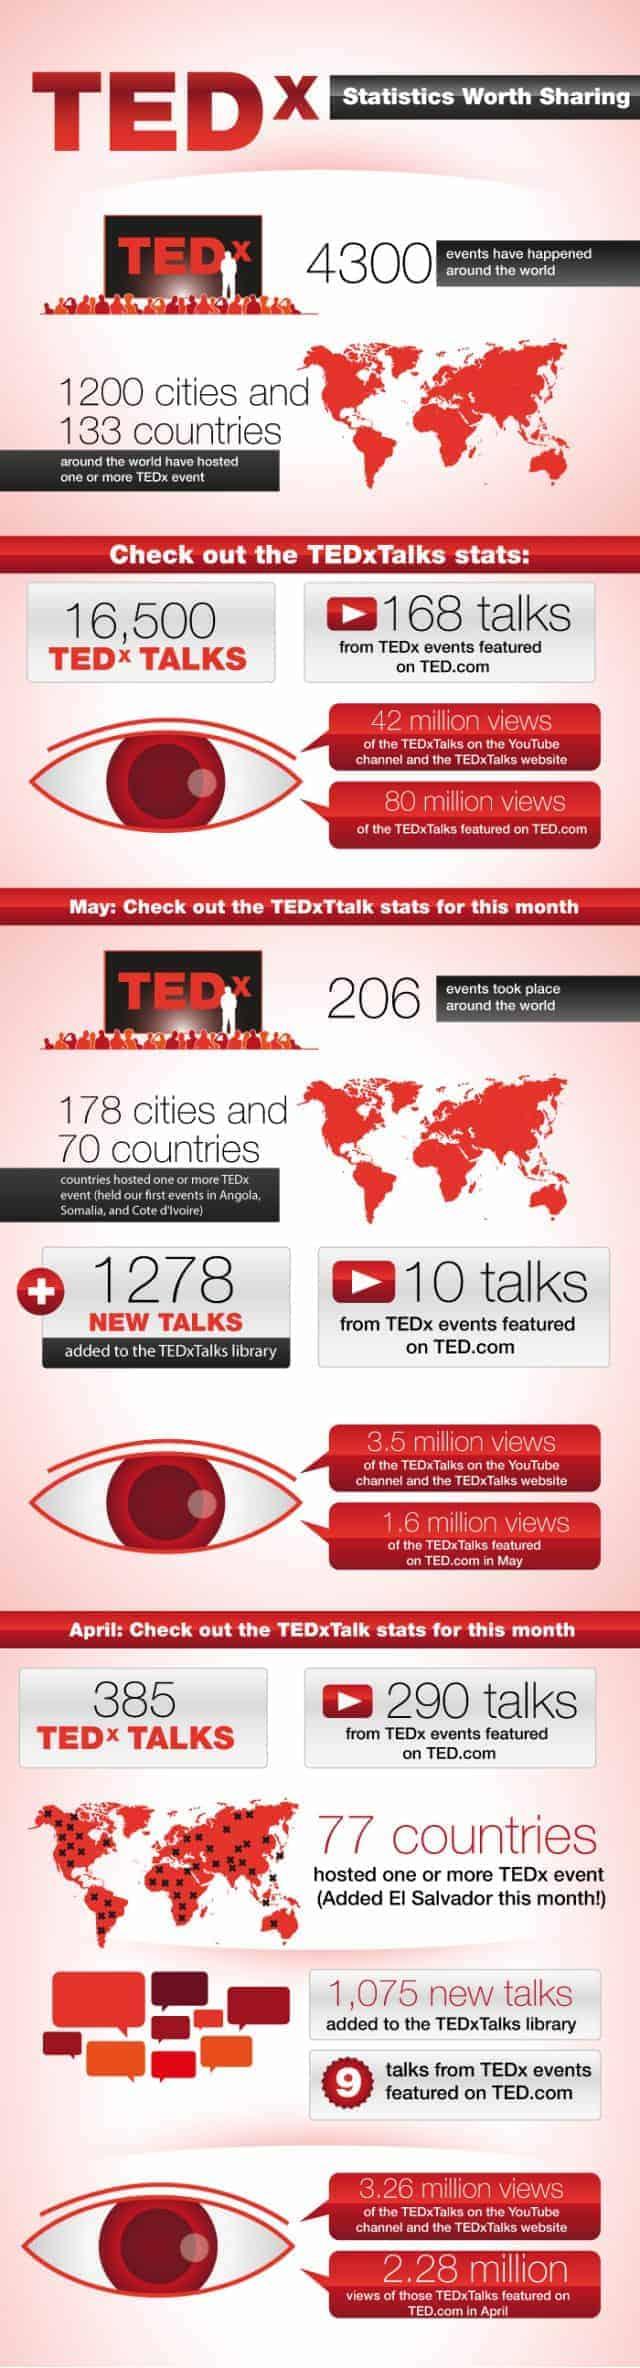 TEDx Statistics Worth Sharing